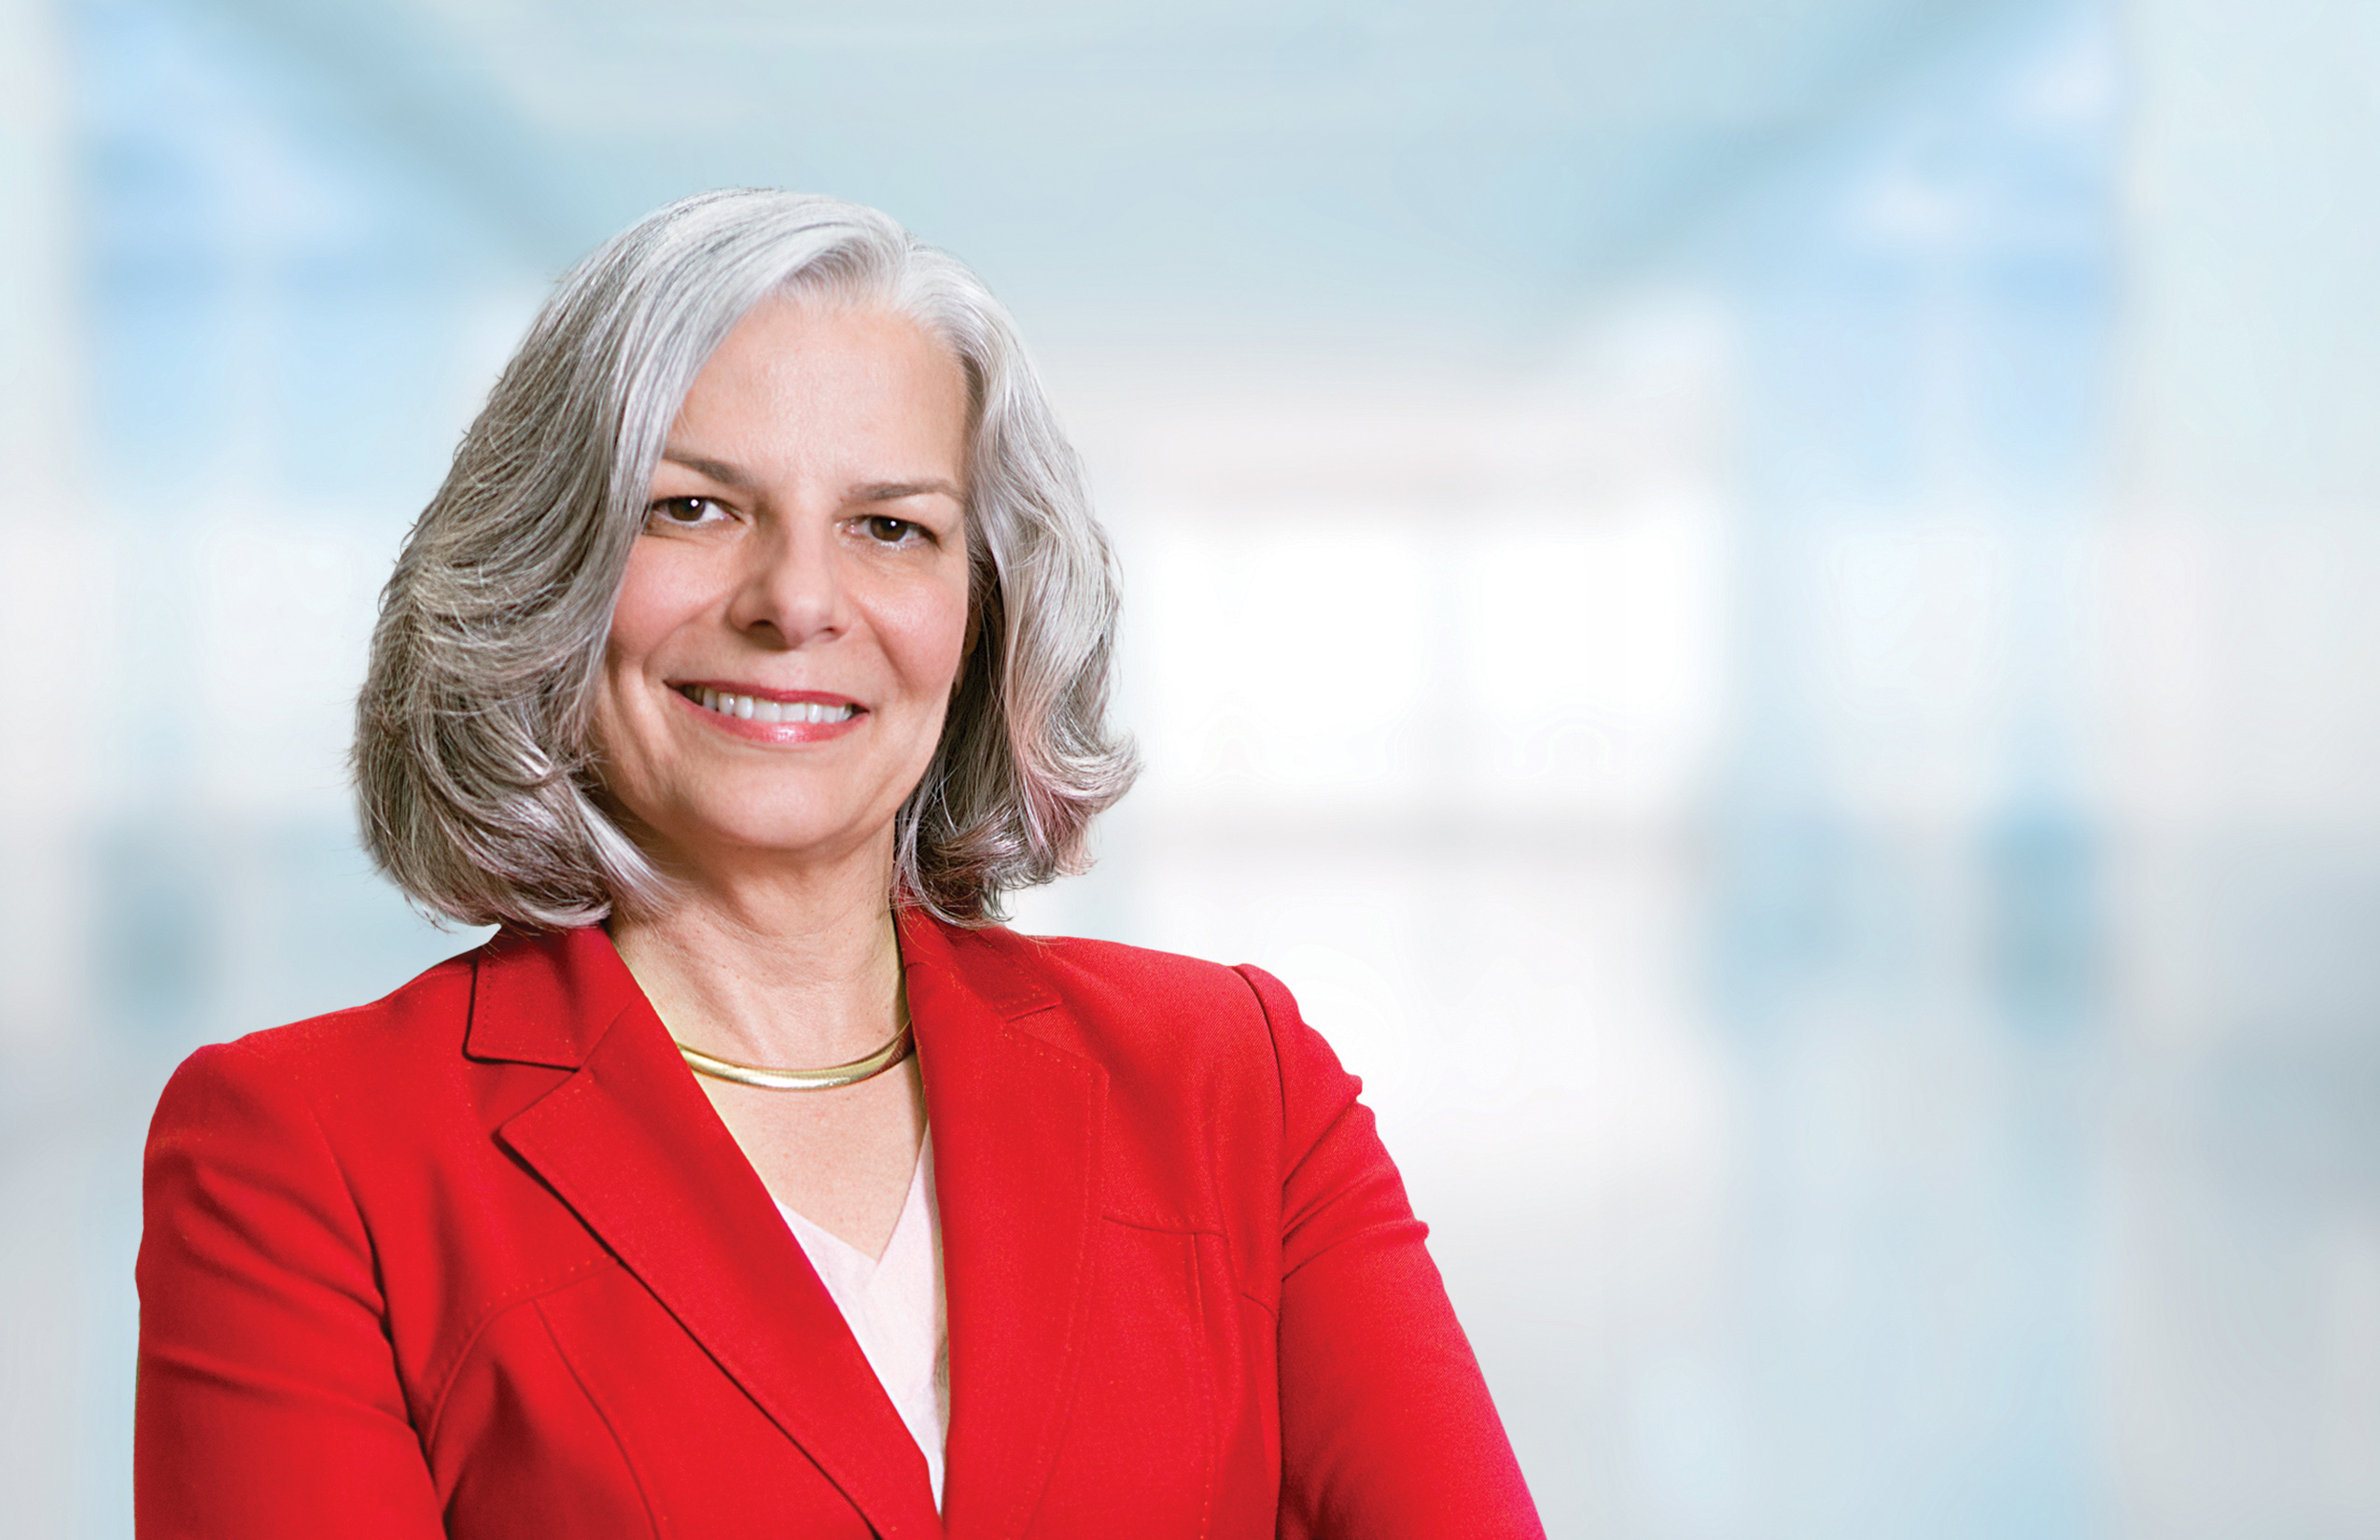 Julie Gerberding